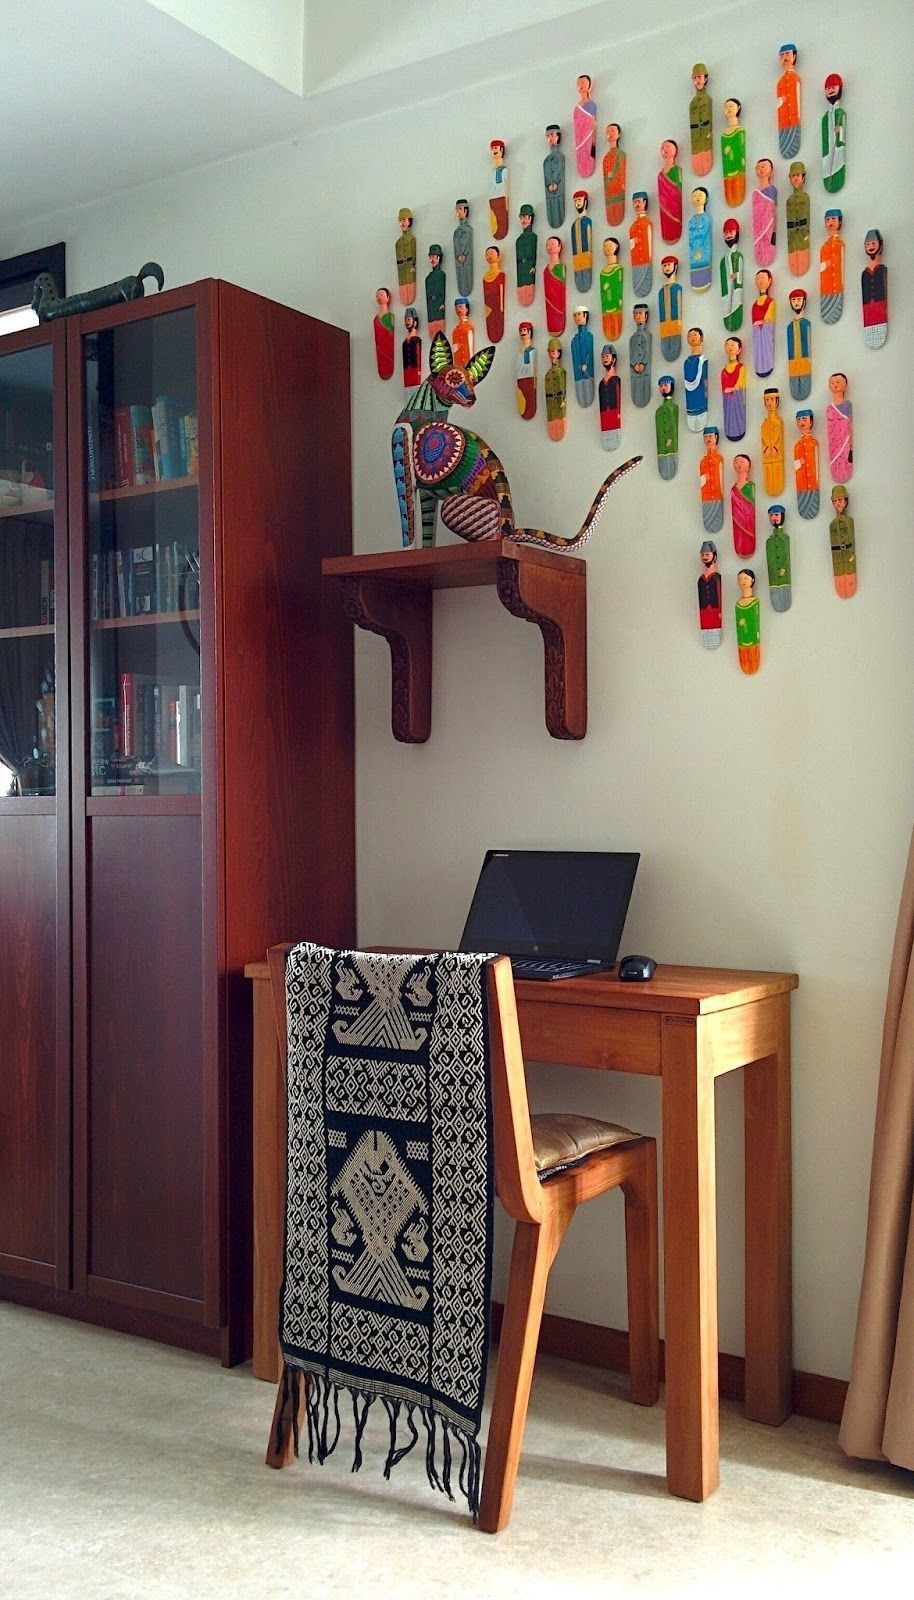 Pin By Phillips Sanjenbam On Home Decor Furniture Design Inspiration Home Decor Home Decor Furniture